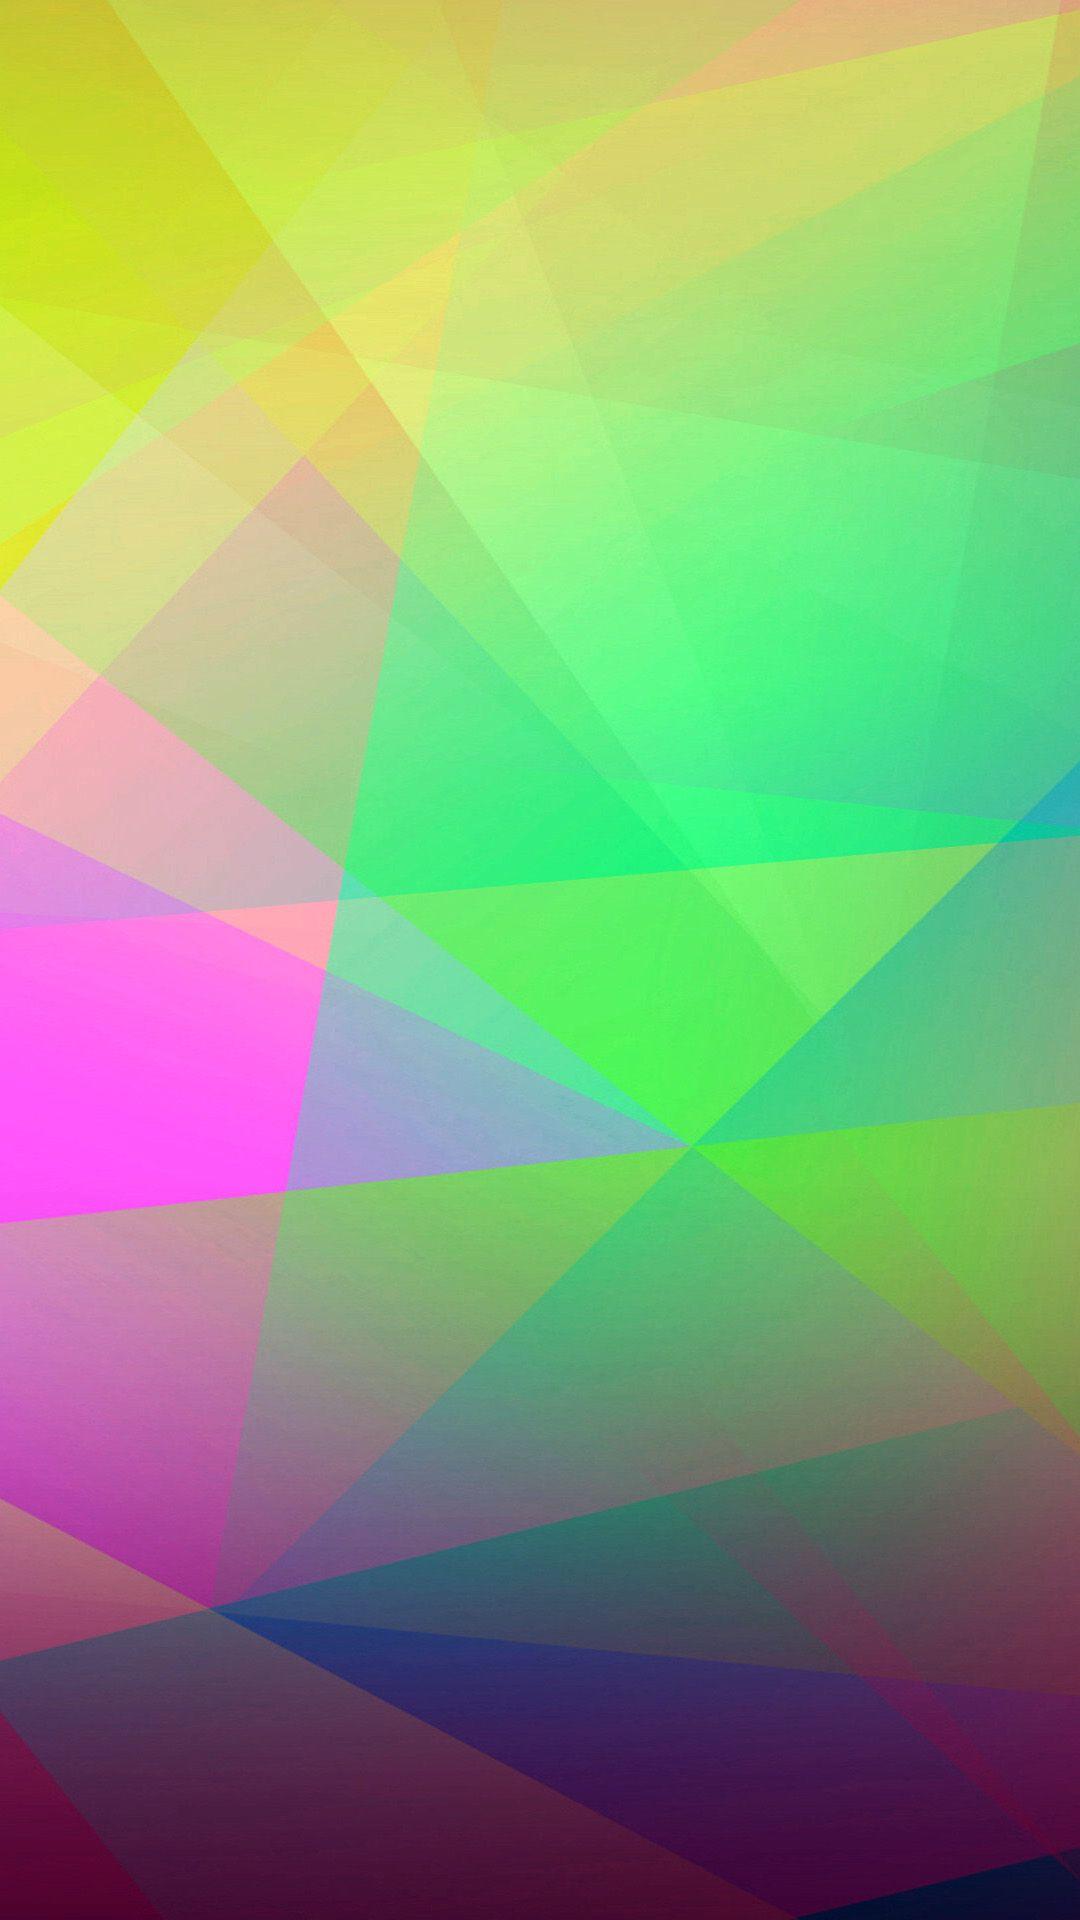 Geometric Artistic Color Mosaic Reformer Line Colorful Pattern Wallpaper Hi